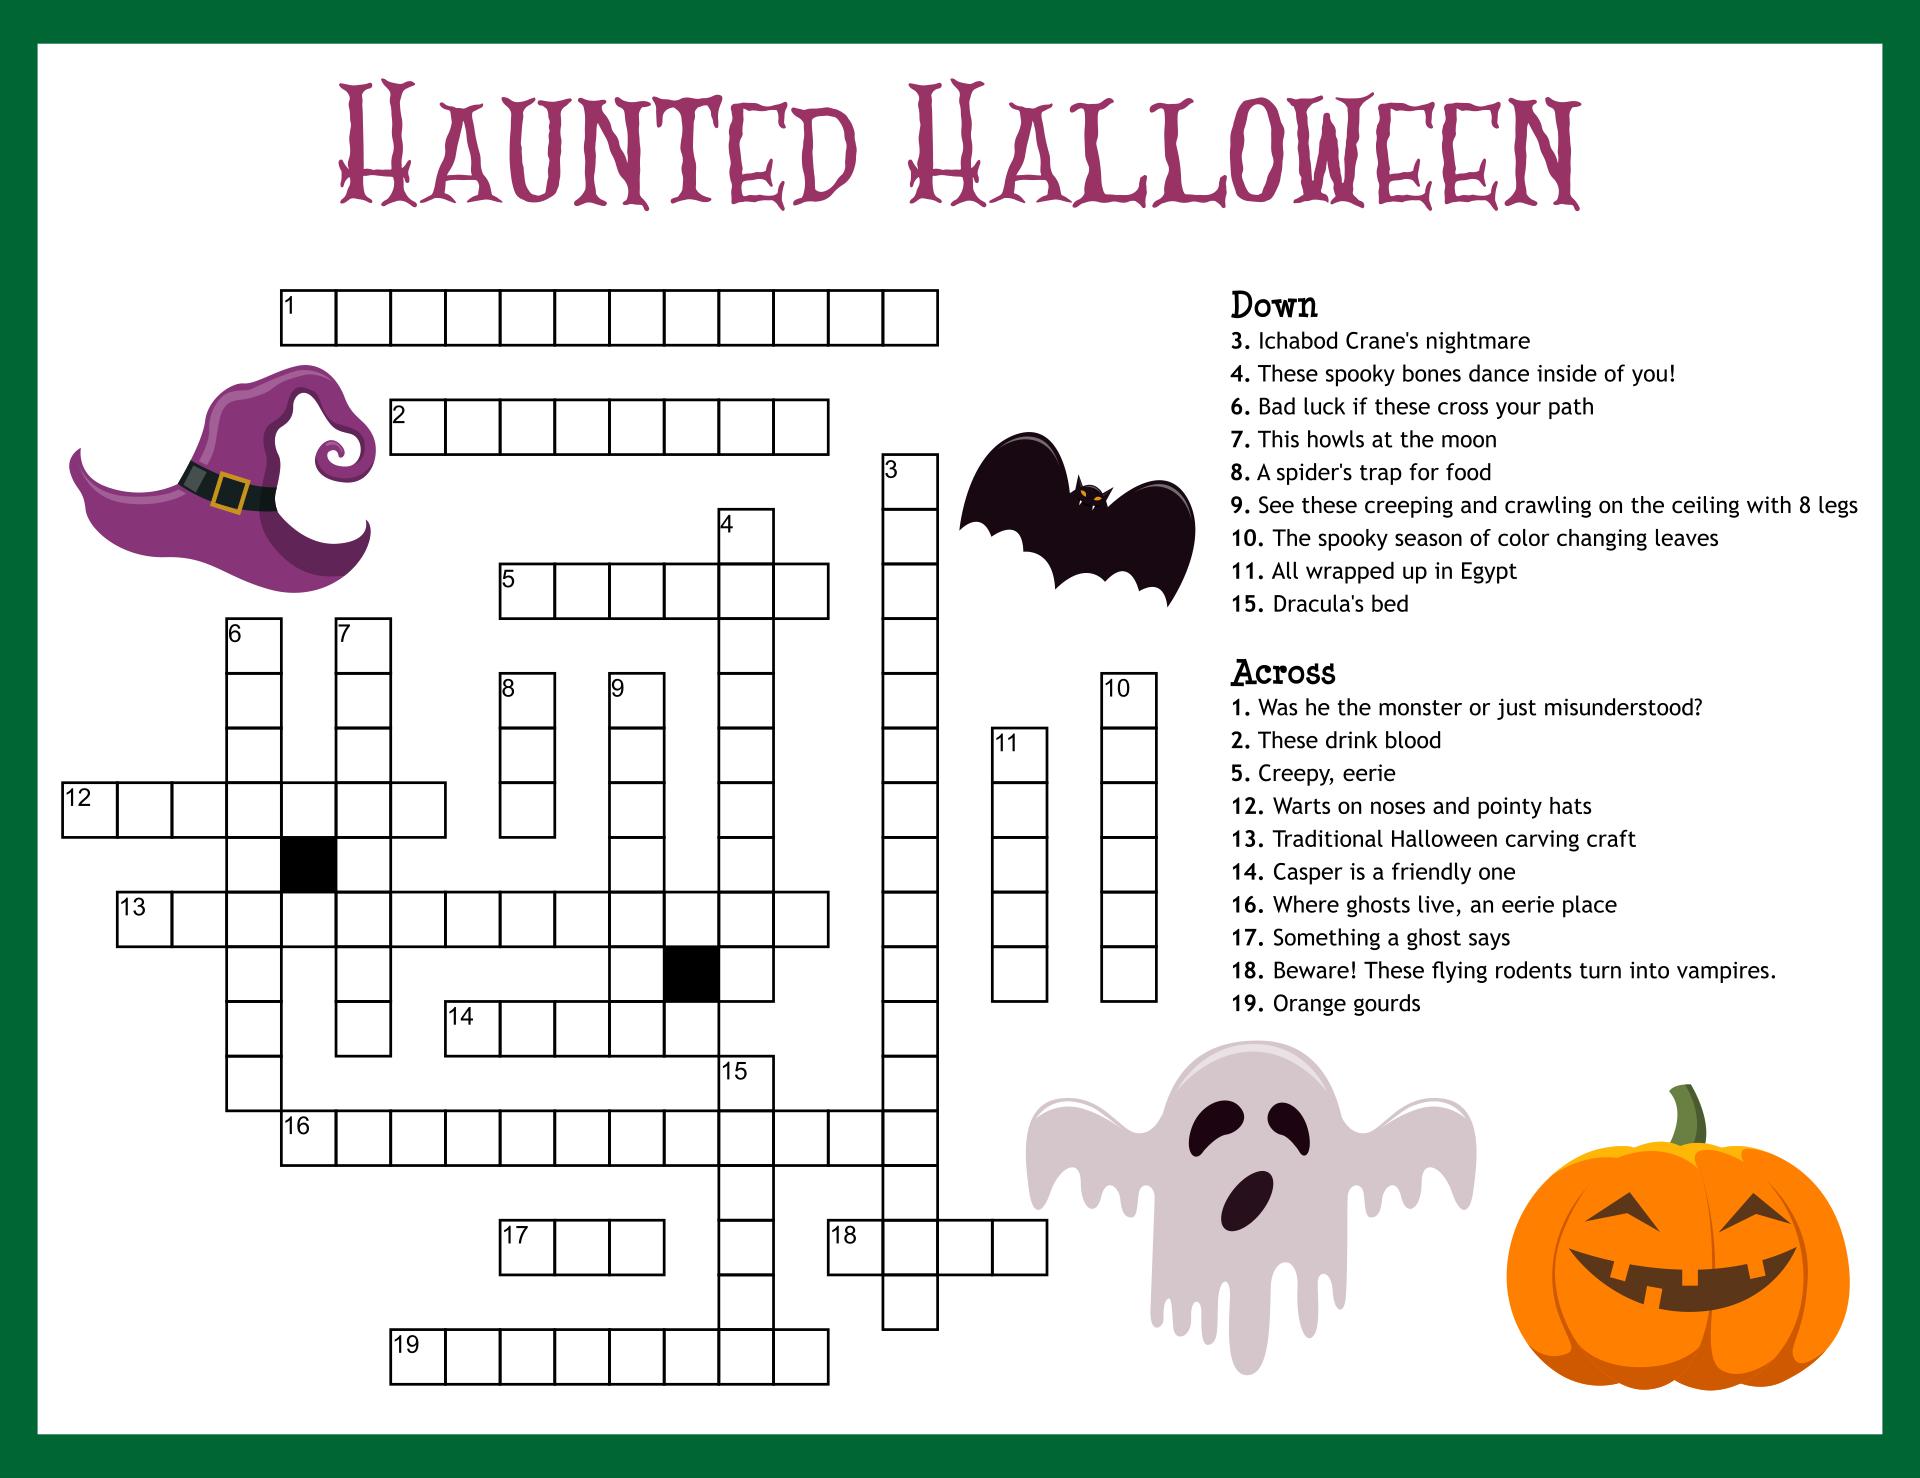 Crossword Puzzles For Halloween Printable